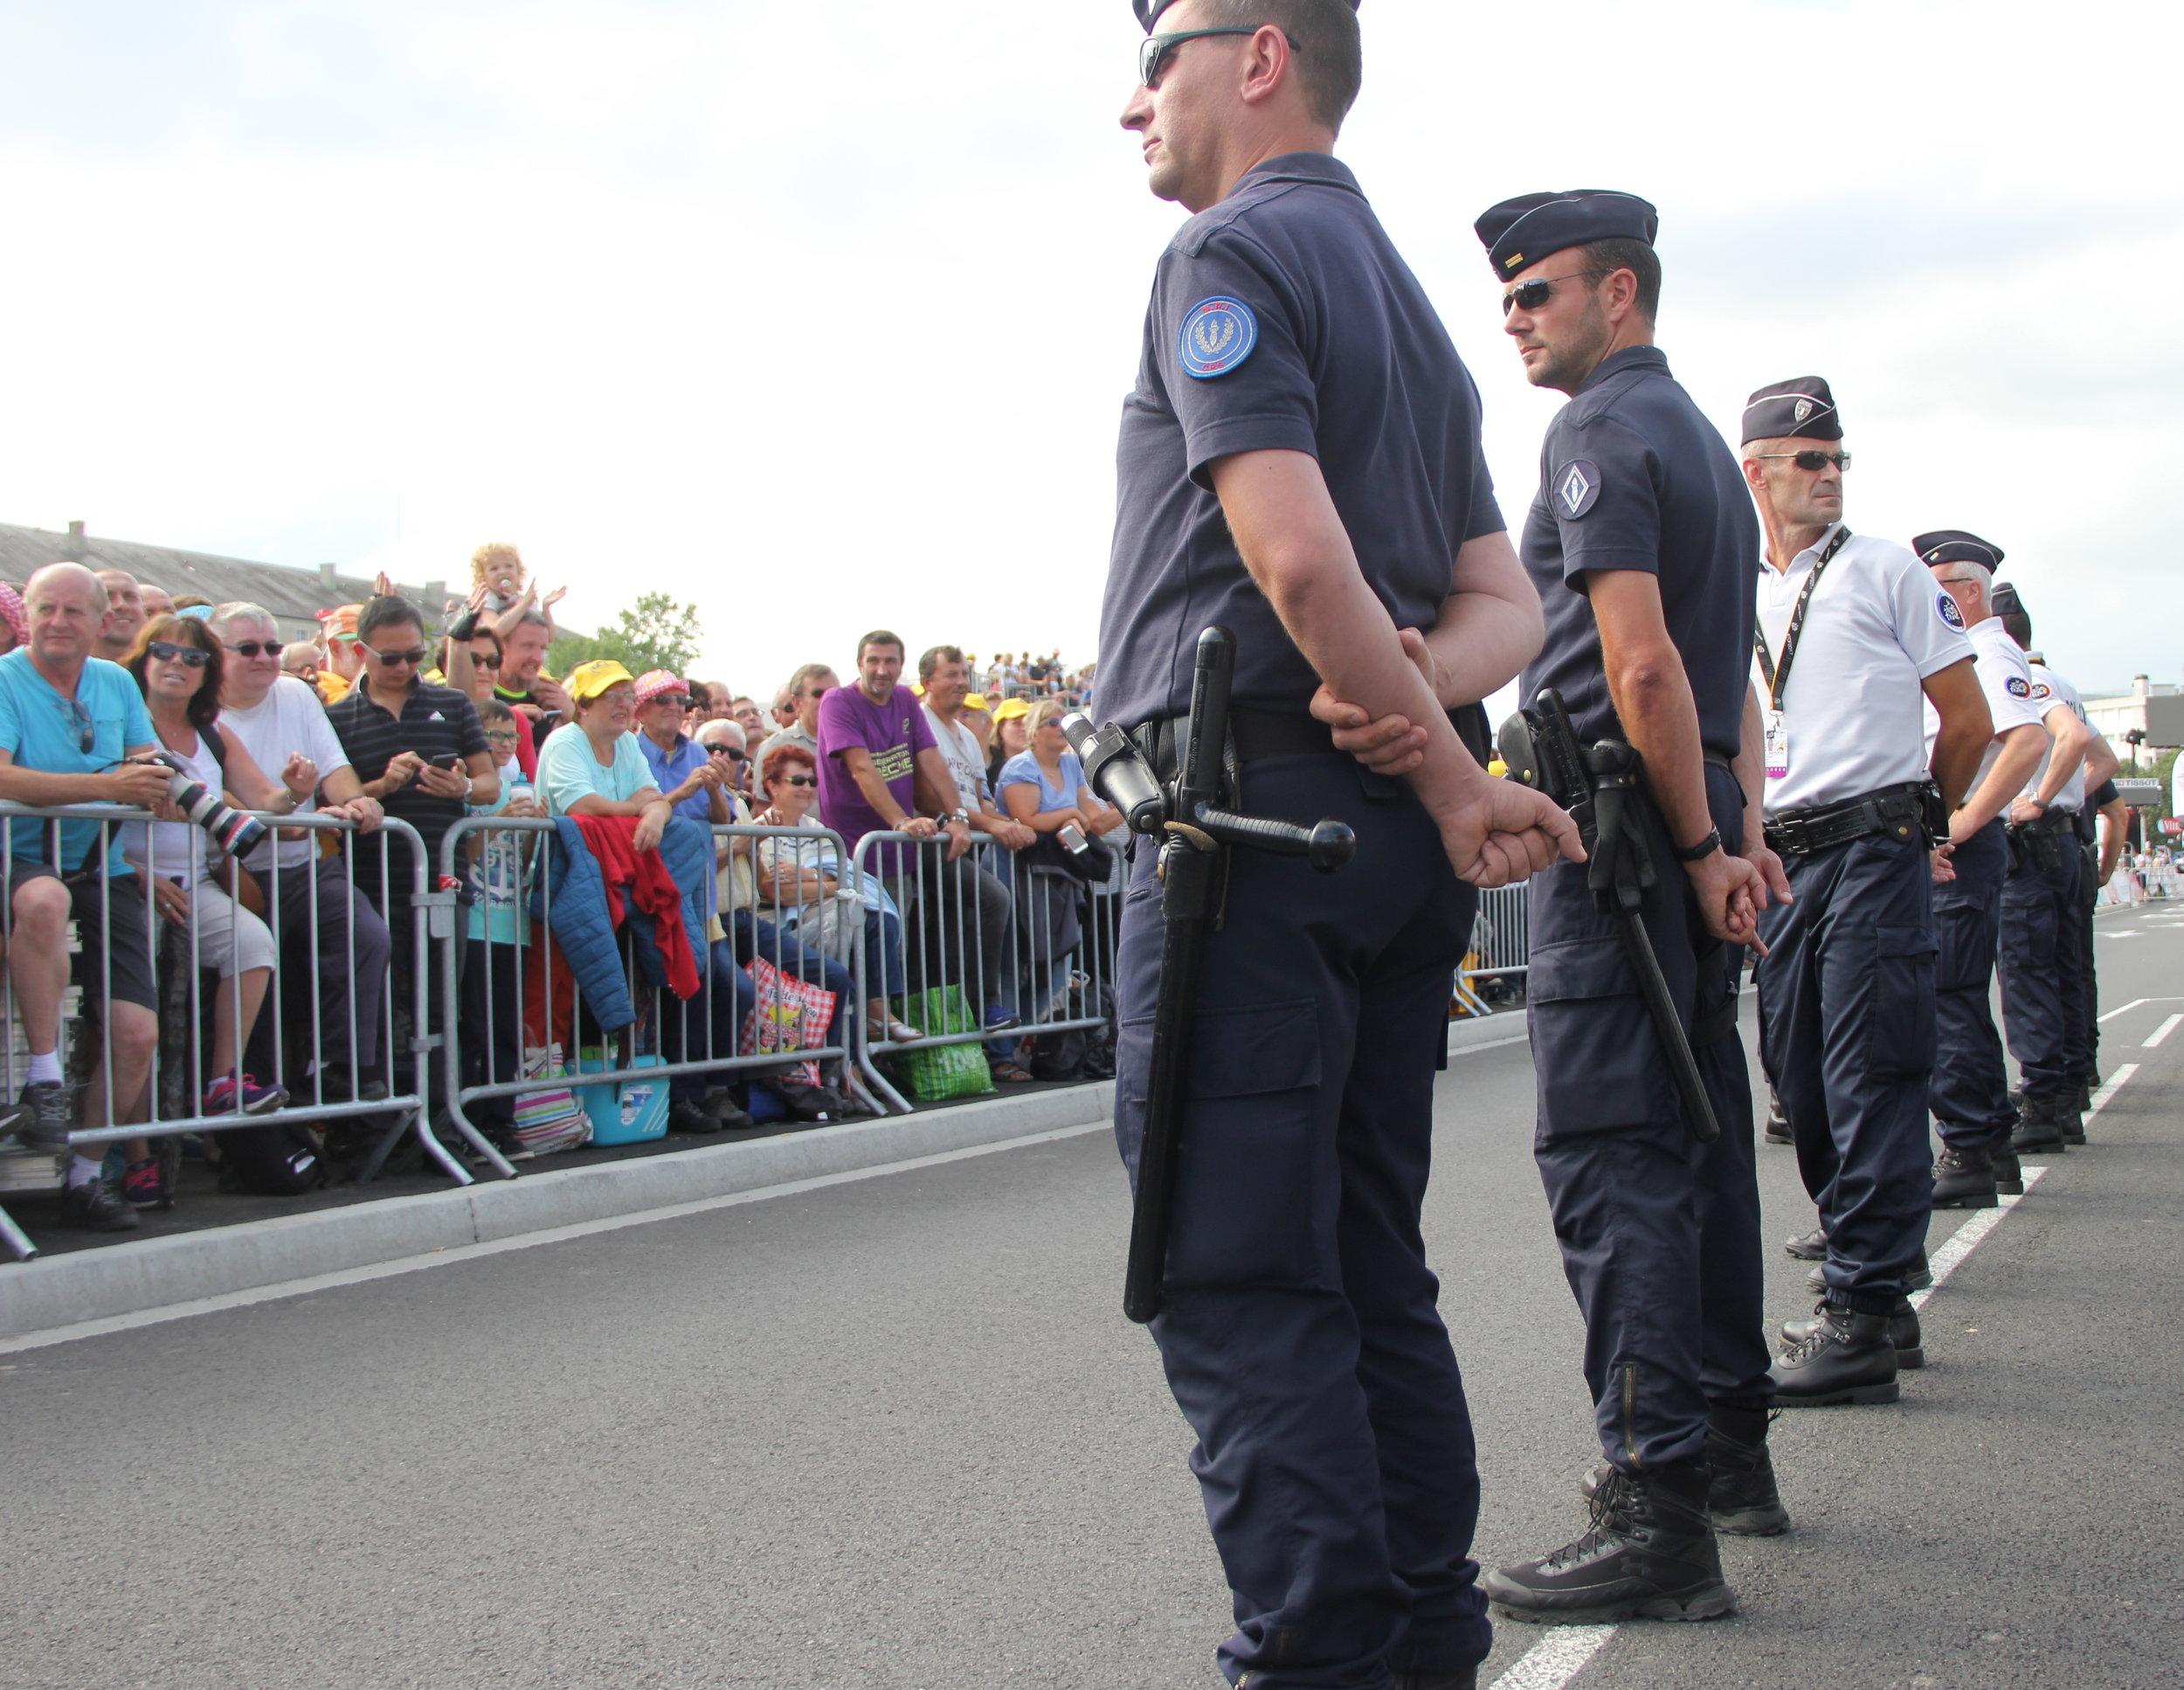 The spectators wait expectantly